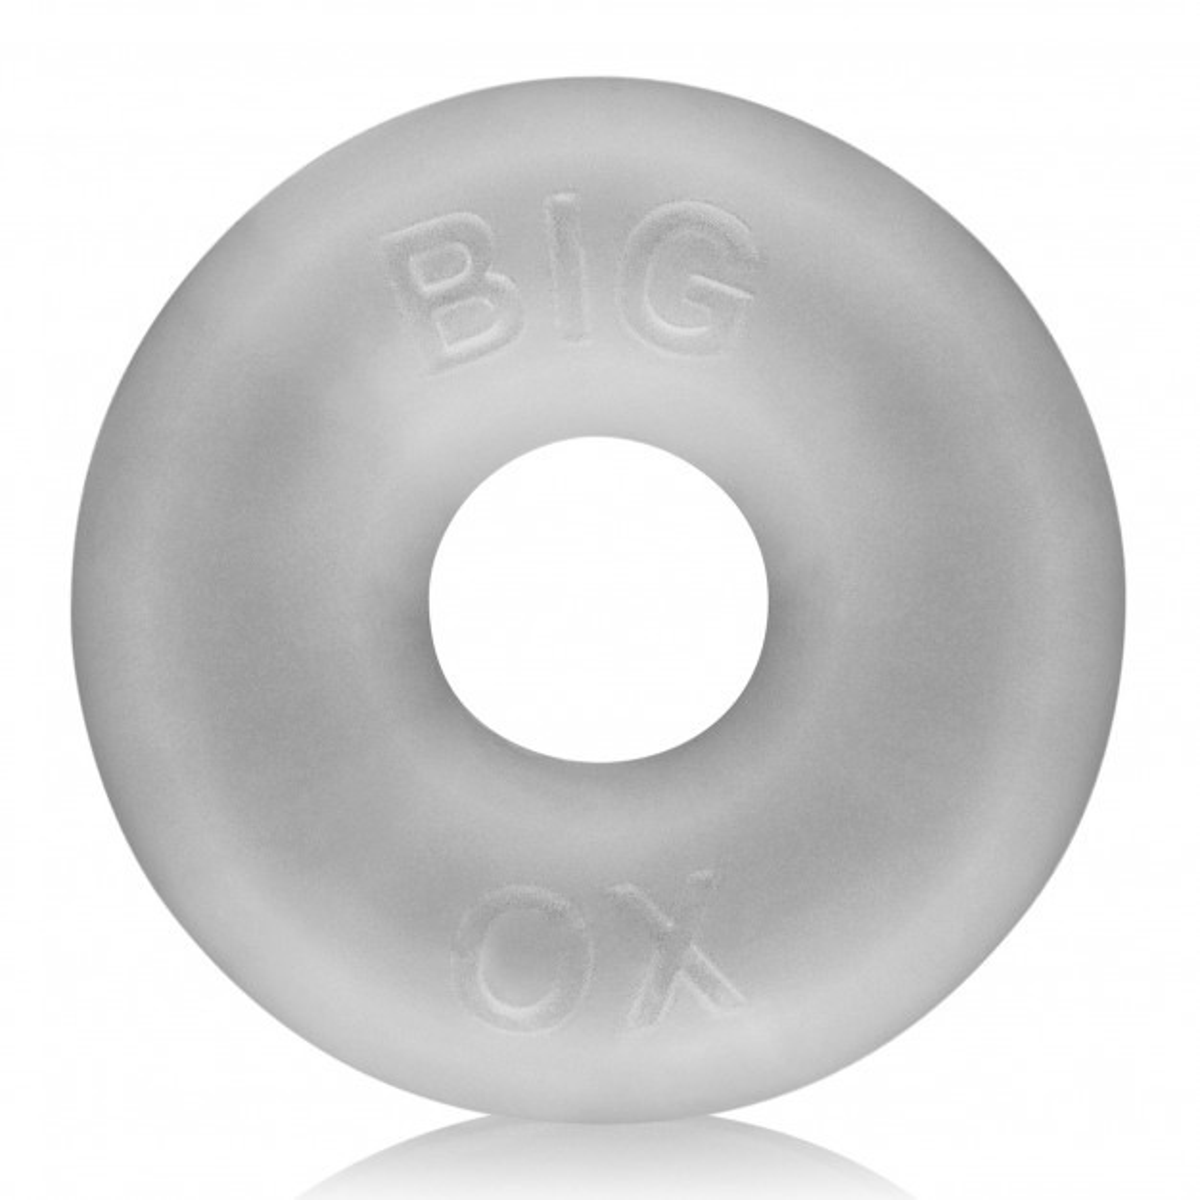 Oxballs Big Ox Cock Ring Cool Ice